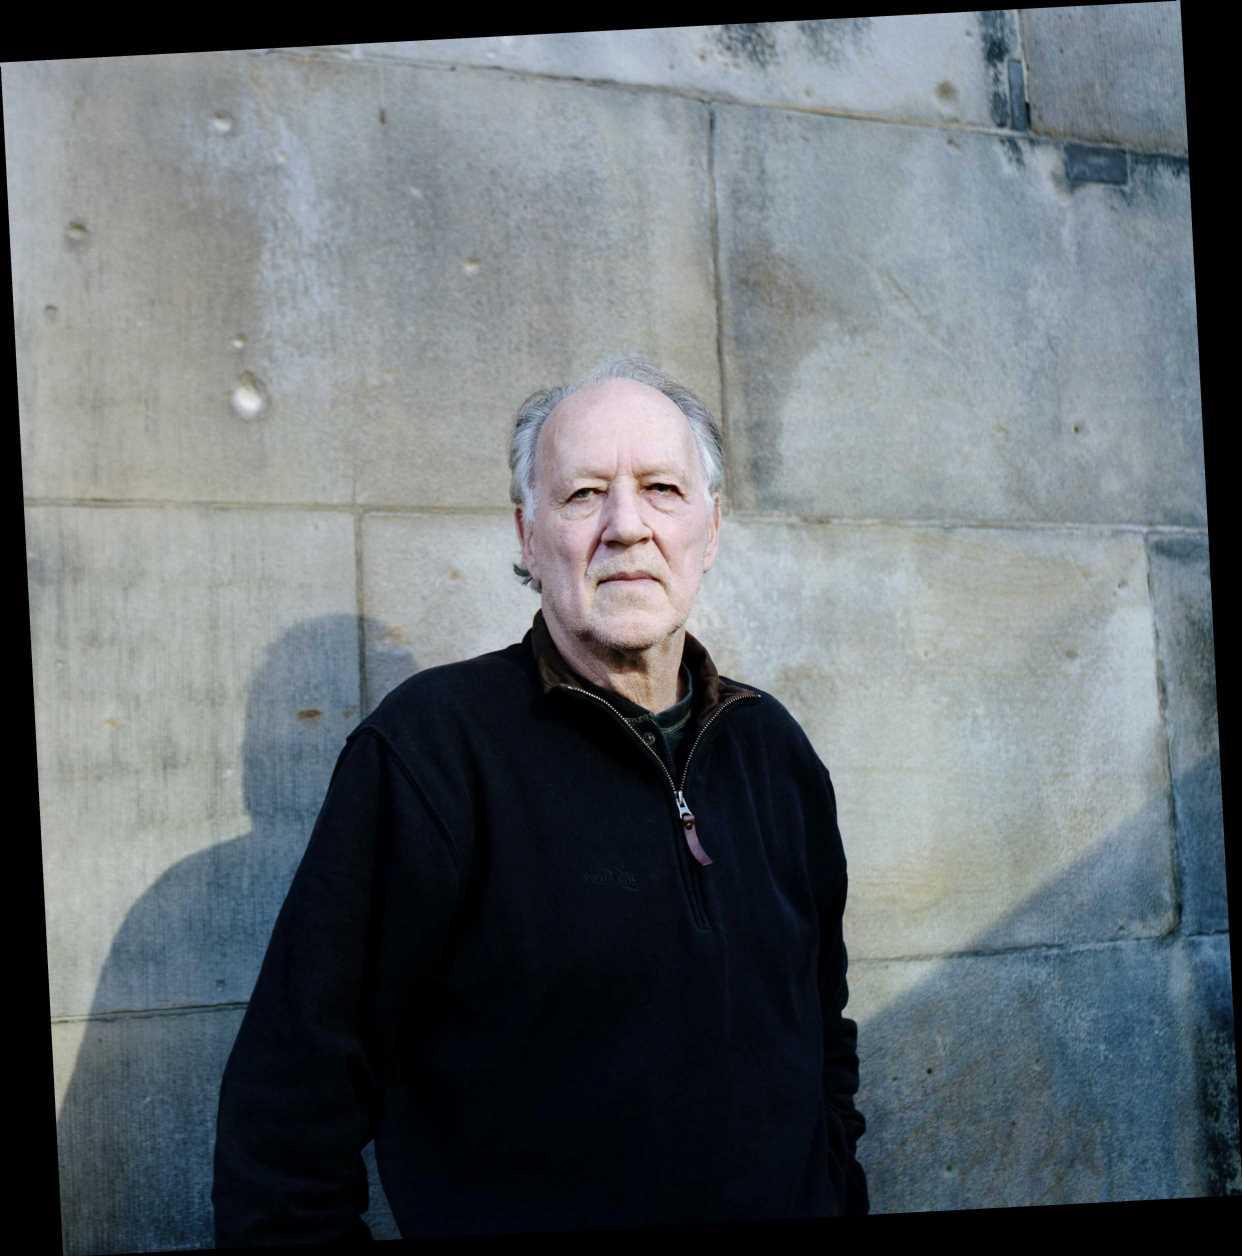 Apple to Release Werner Herzog Documentary 'Fireball'